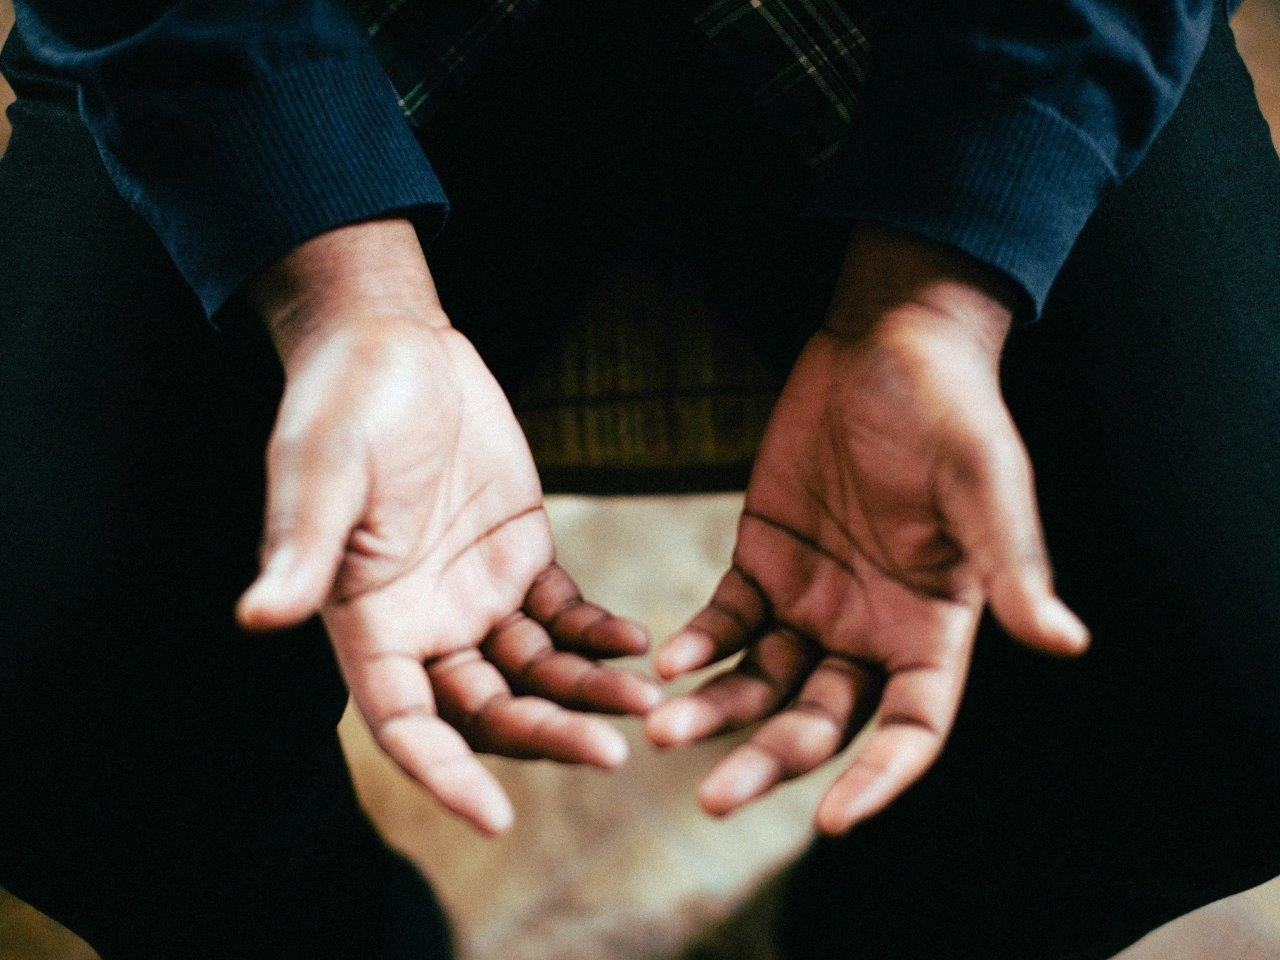 God Answers Prayers! Our Virtual Prayer Circle